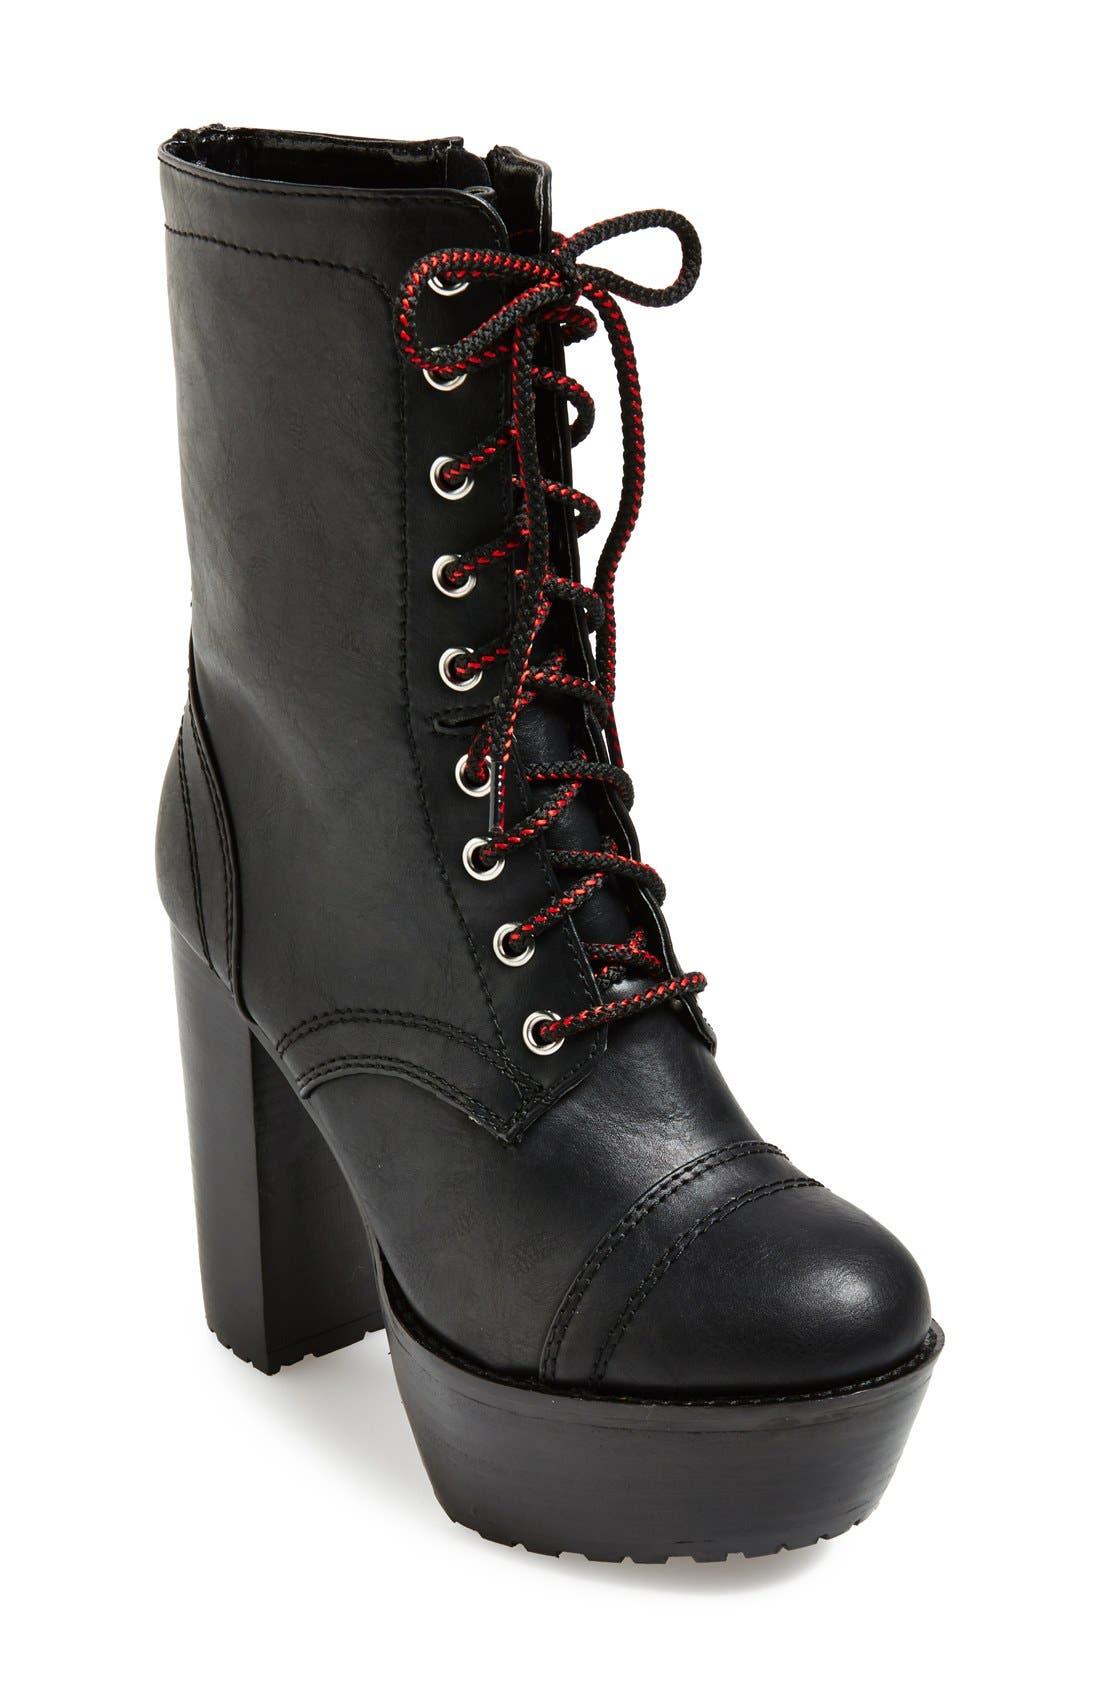 Main Image - KENDALL + KYLIE Madden Girl 'Averryy' Platform Mid Boot (Women)